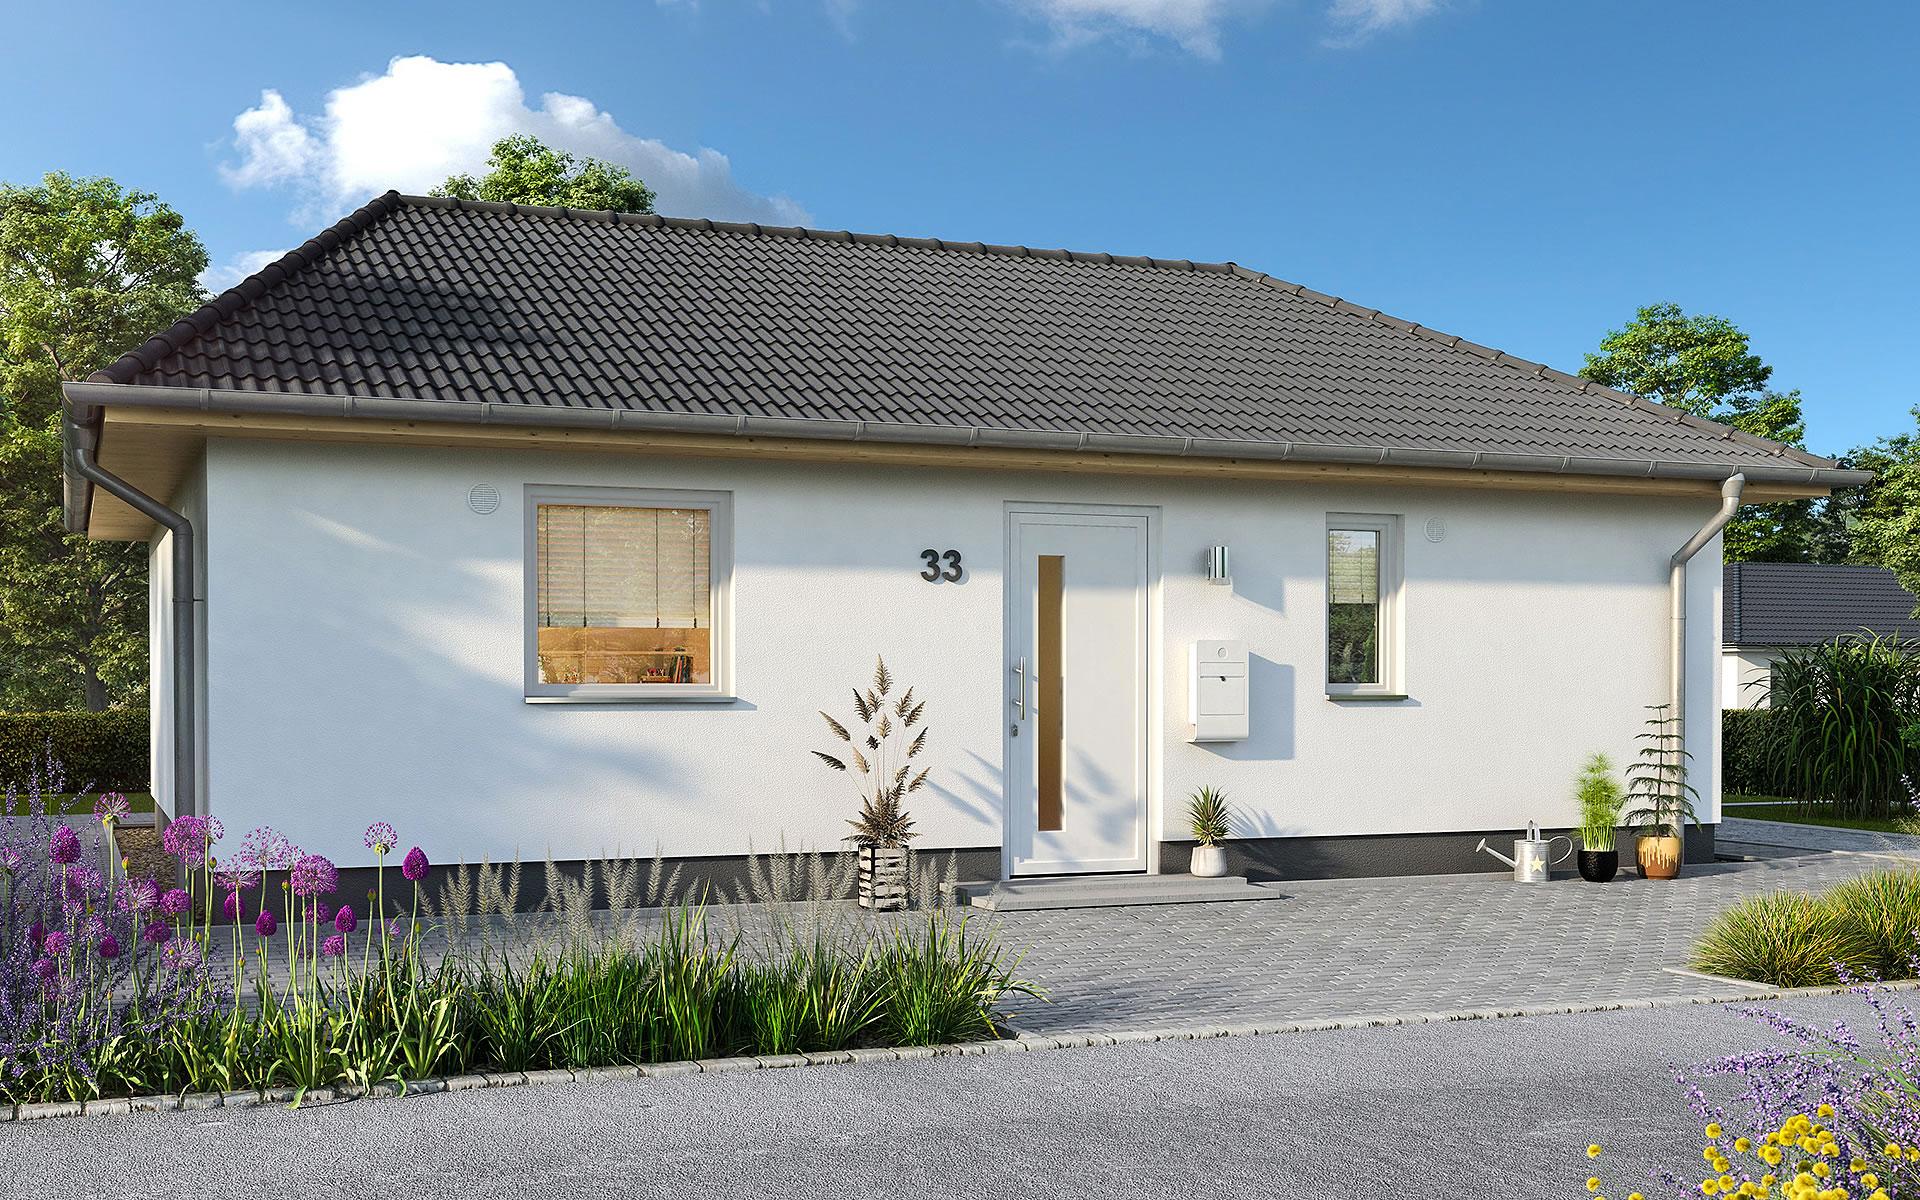 Aktionshaus Aspekt 78 - Town & Country Haus Lizenzgeber GmbH